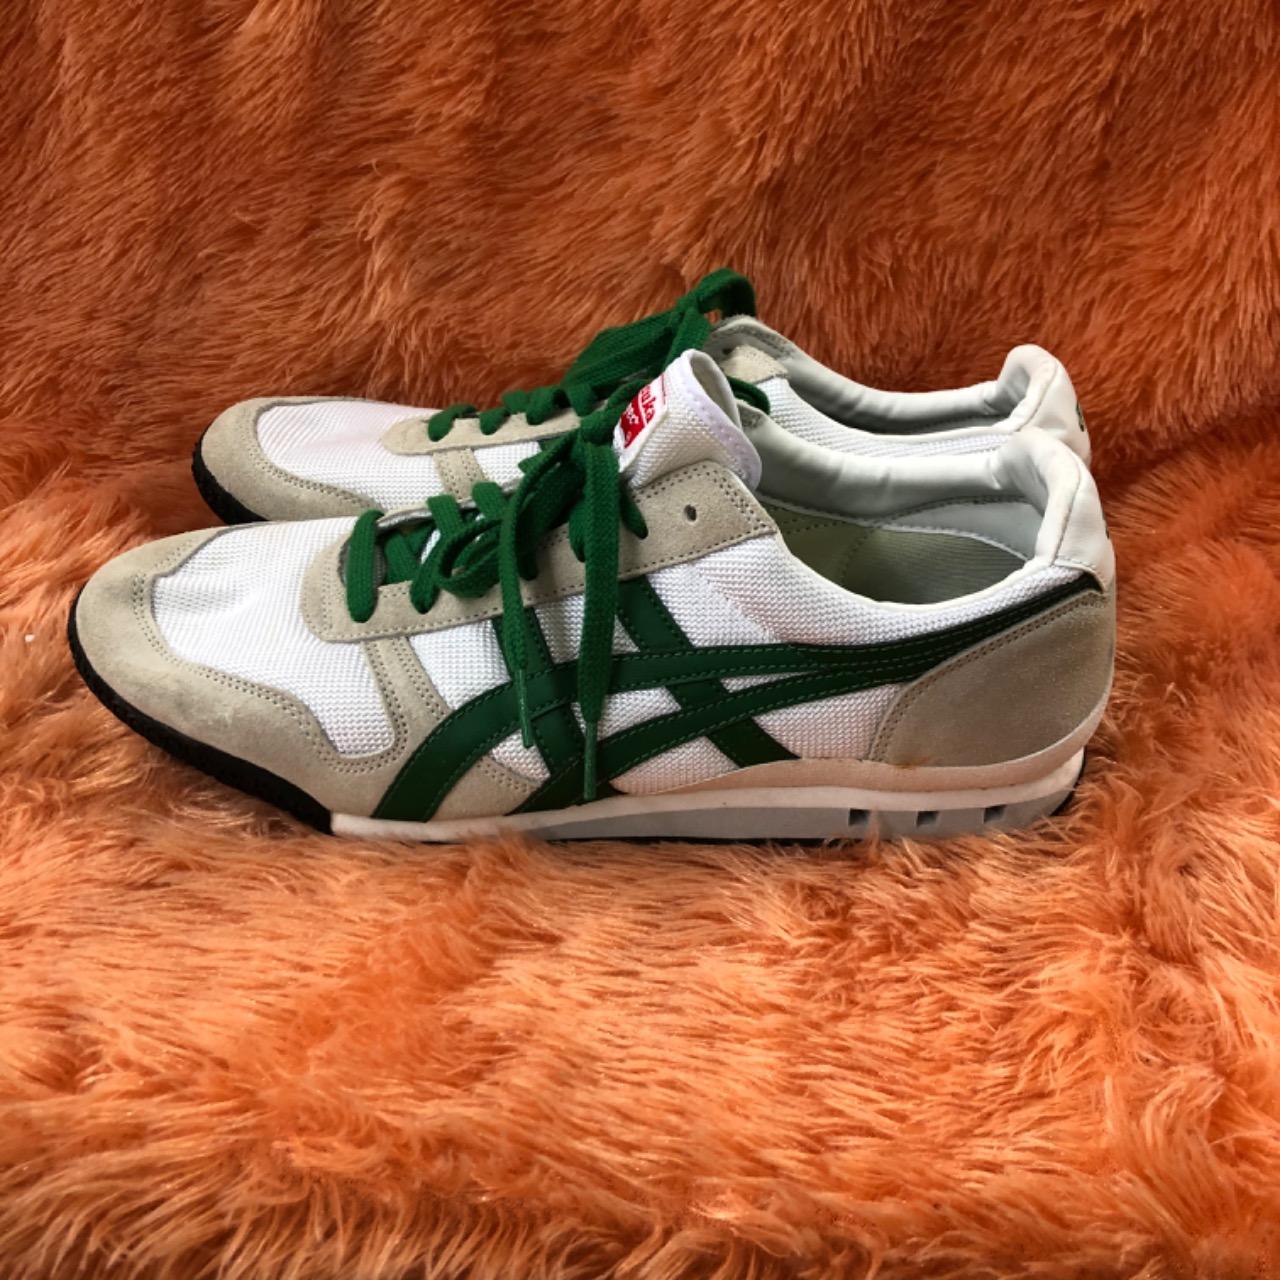 Onitsuka Tiger Mens  Size 11 White/Green